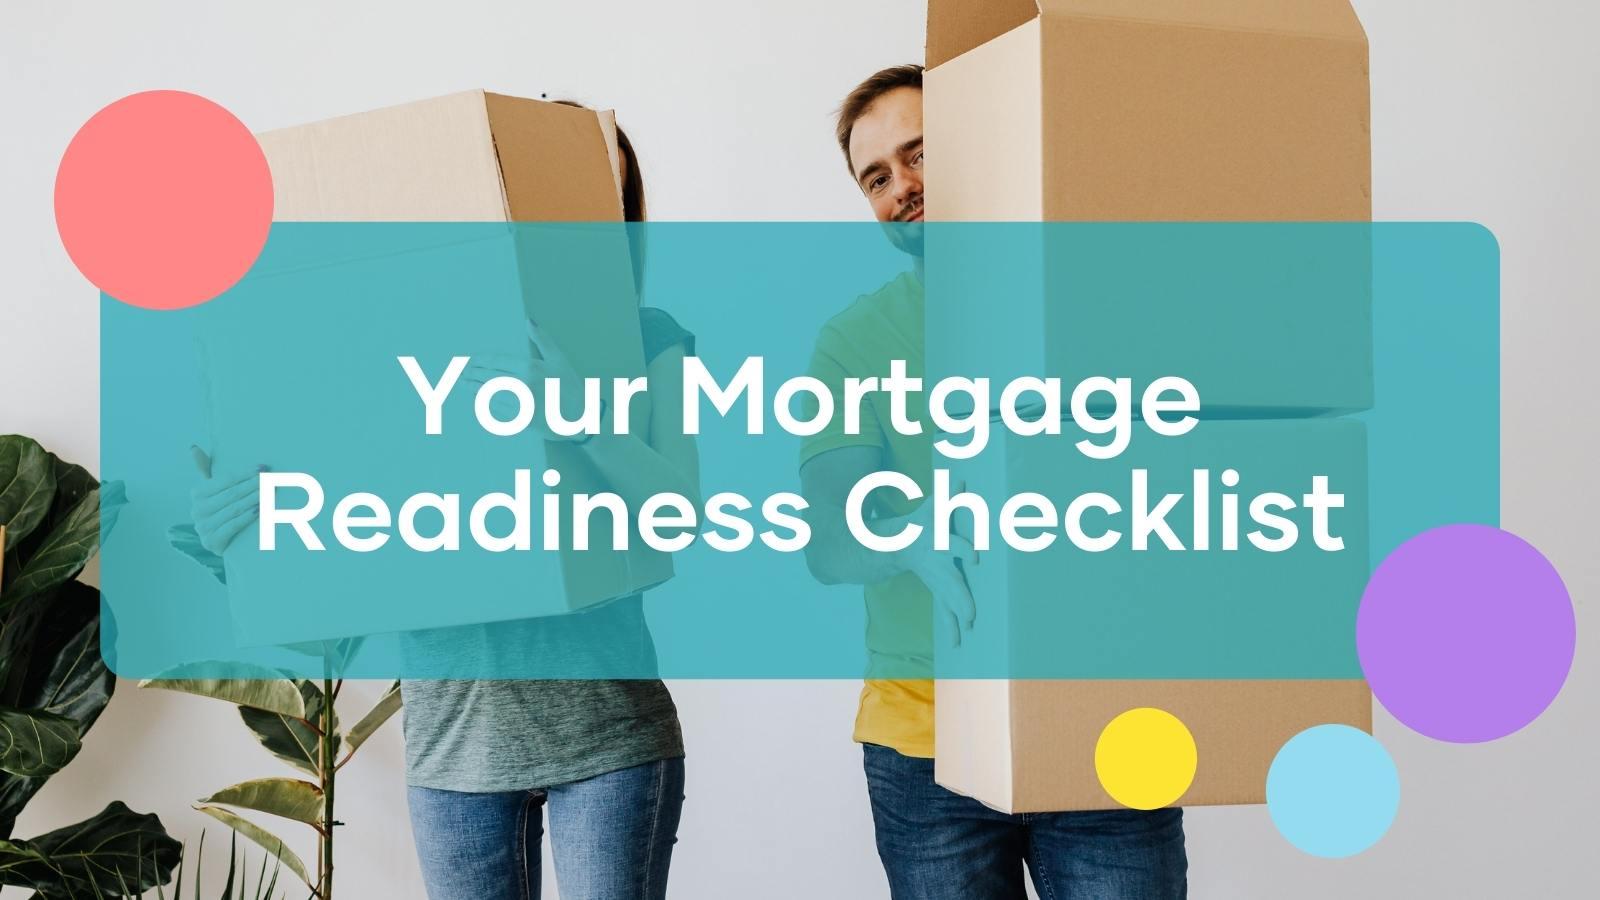 Mortgage readiness checklist.jpg